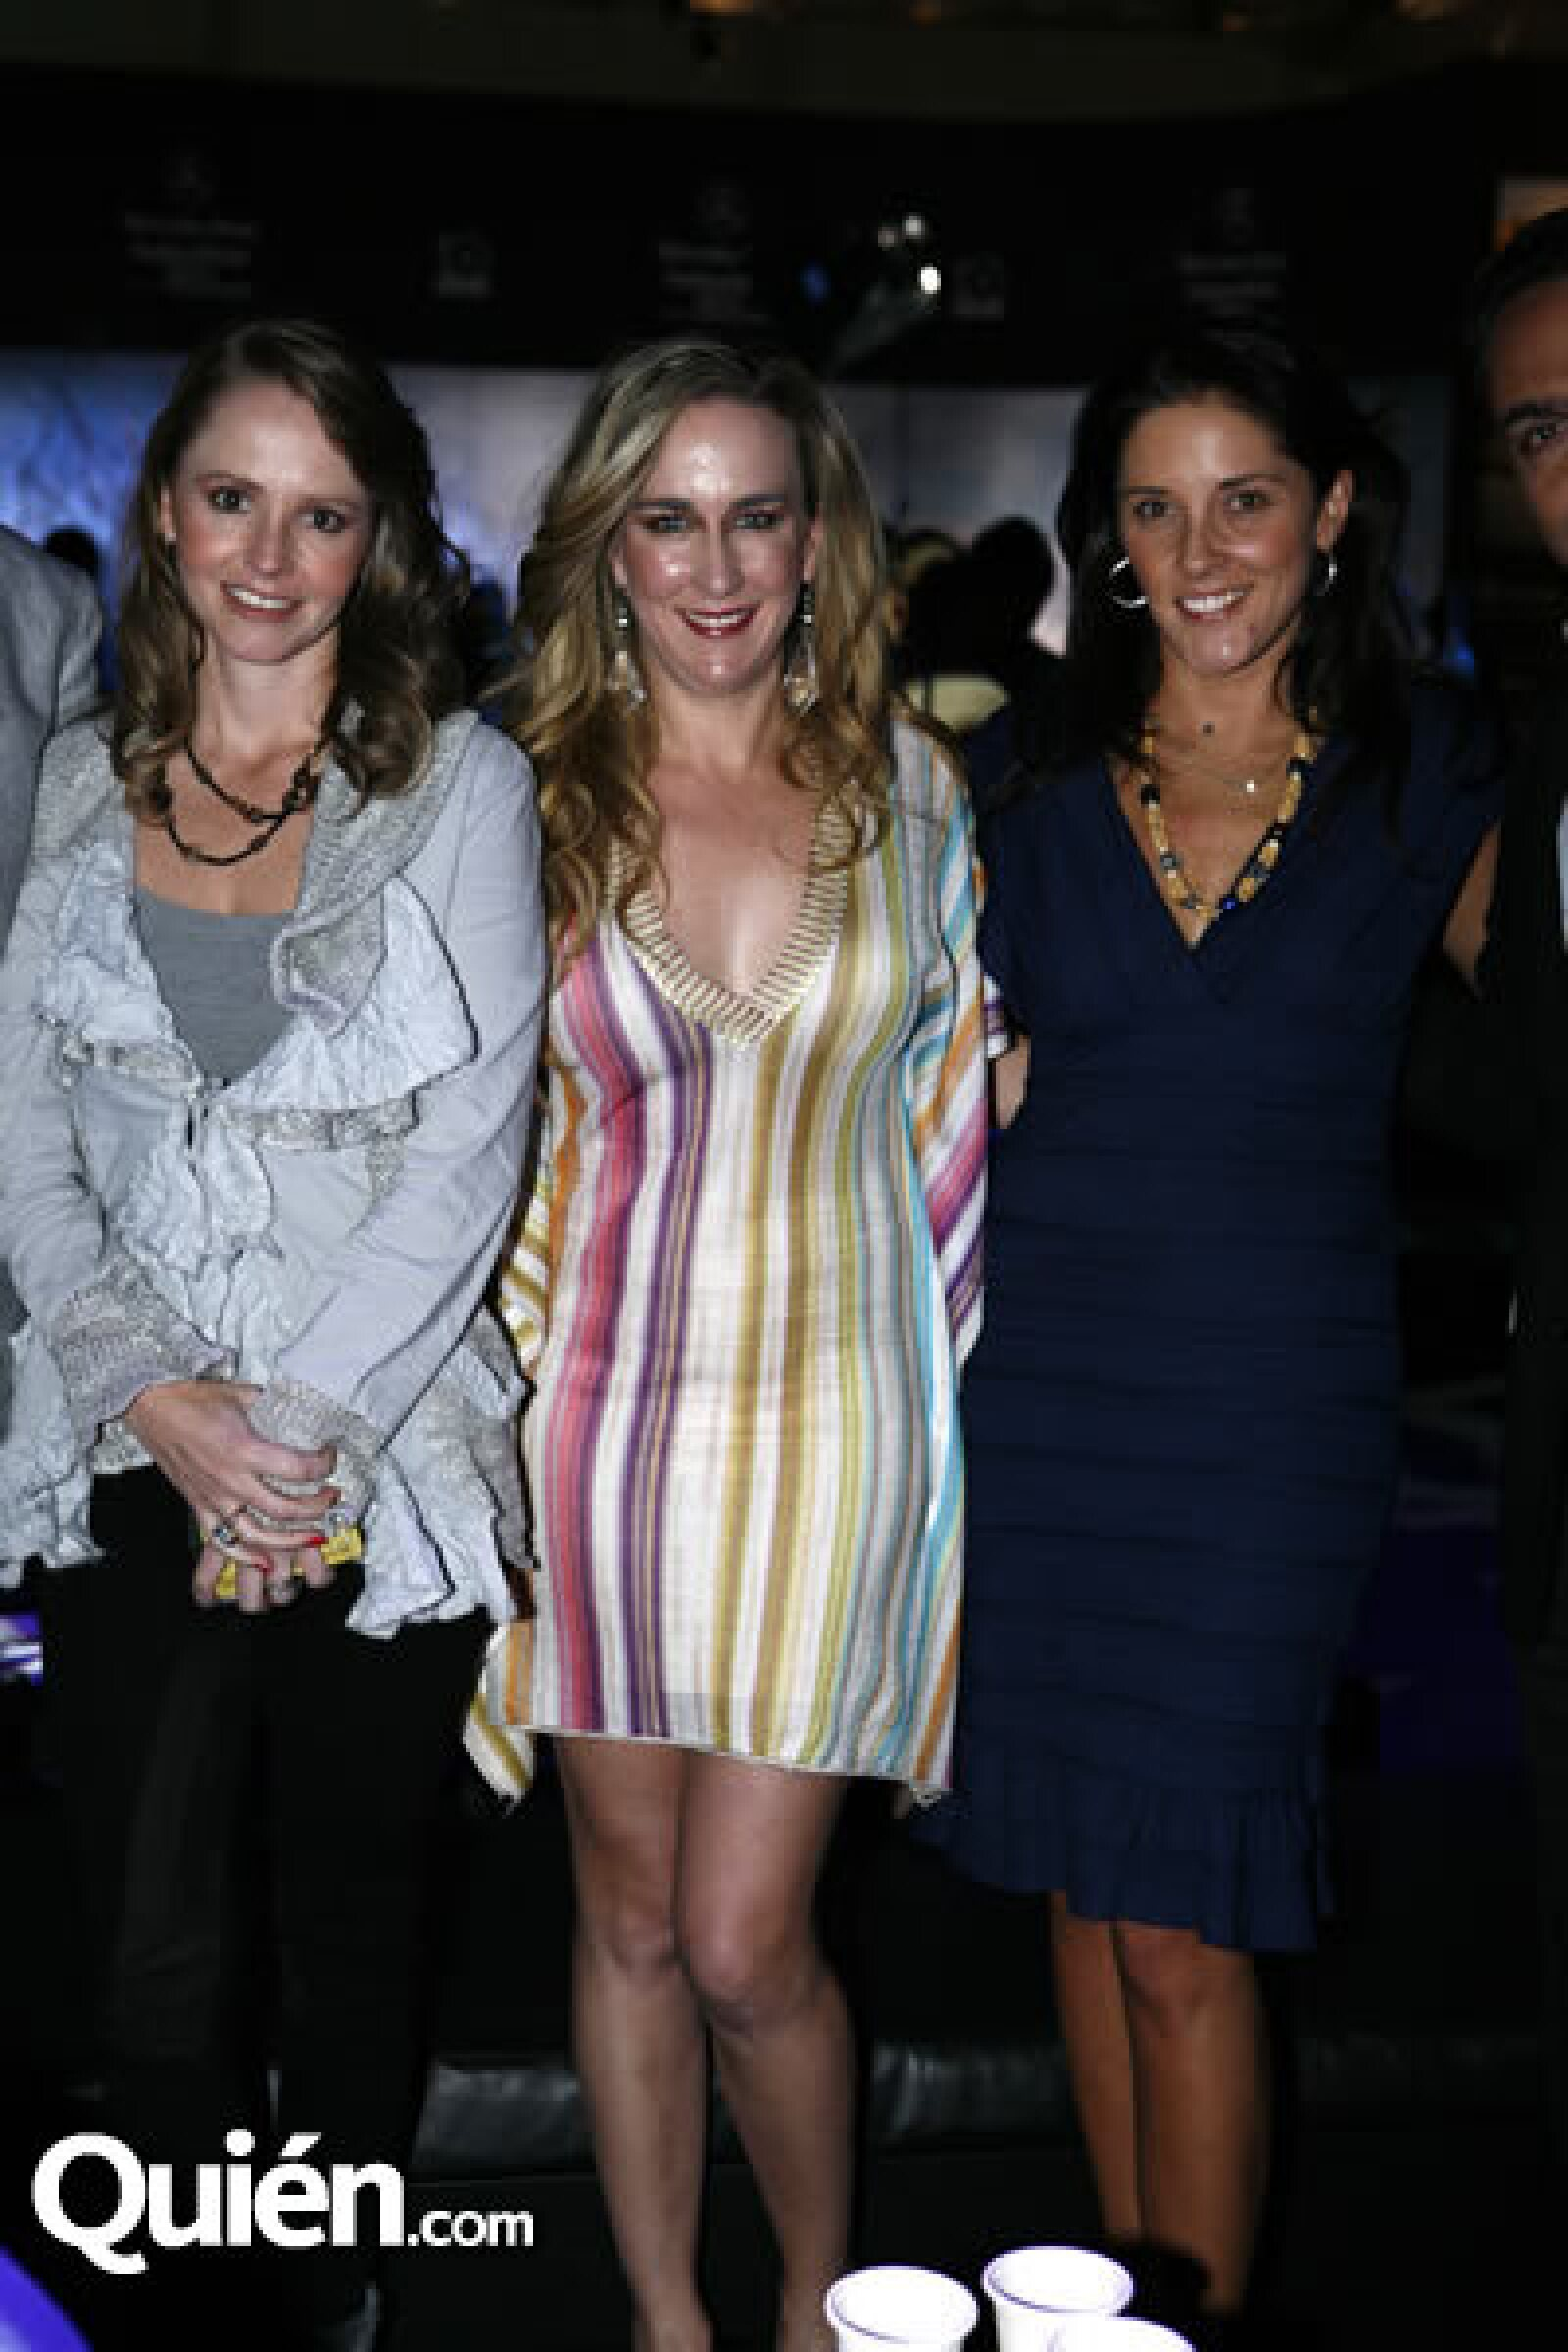 Denisse Casanova, Tania Odabachian y Marcela Pezet